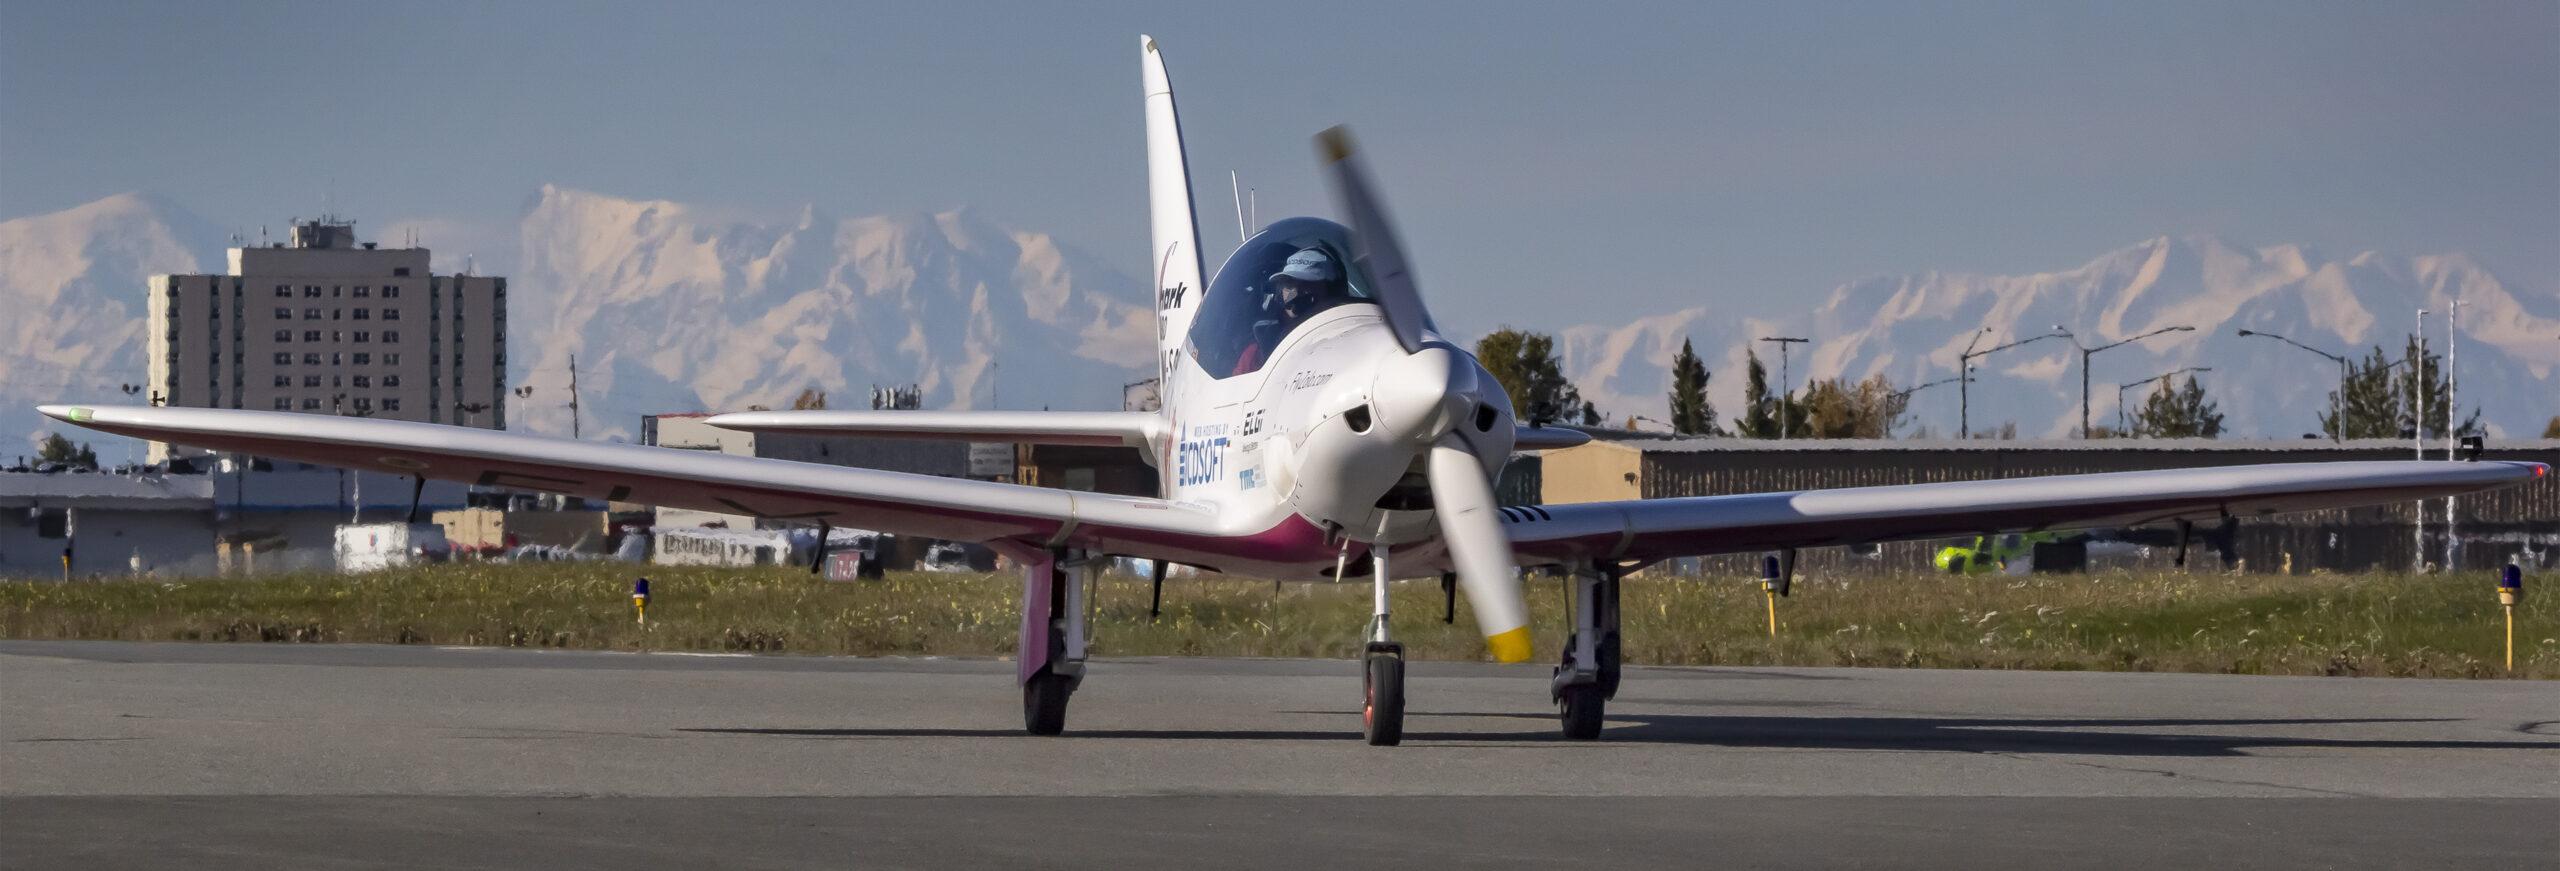 Aircraft taxing on at Merrill Field Alaska